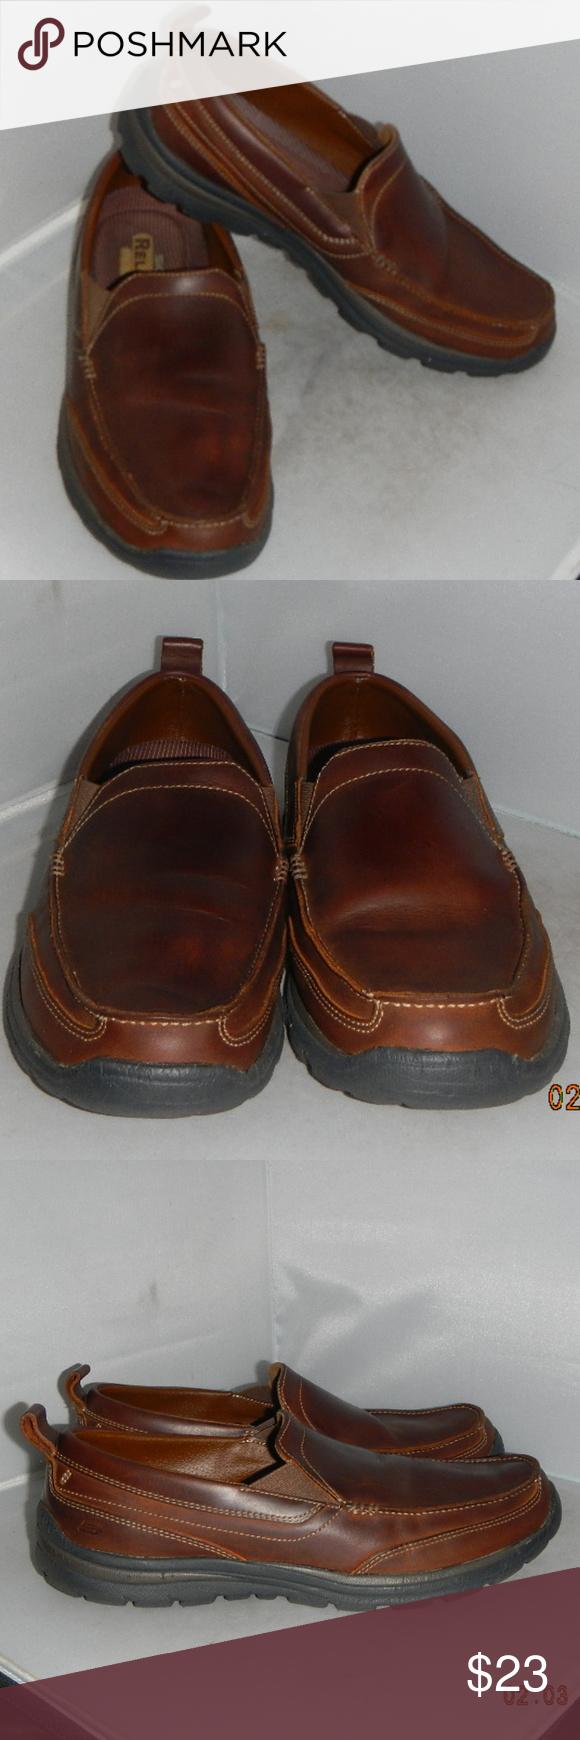 b6fd3ac7e1912e Skechers Superior Gains Slip-On Loafers Mens 10.5M Skechers Superior-Gain  Slip-on Loafers Brown leather, Mens size 10.5 Medium Dual side elastic  fabric ...